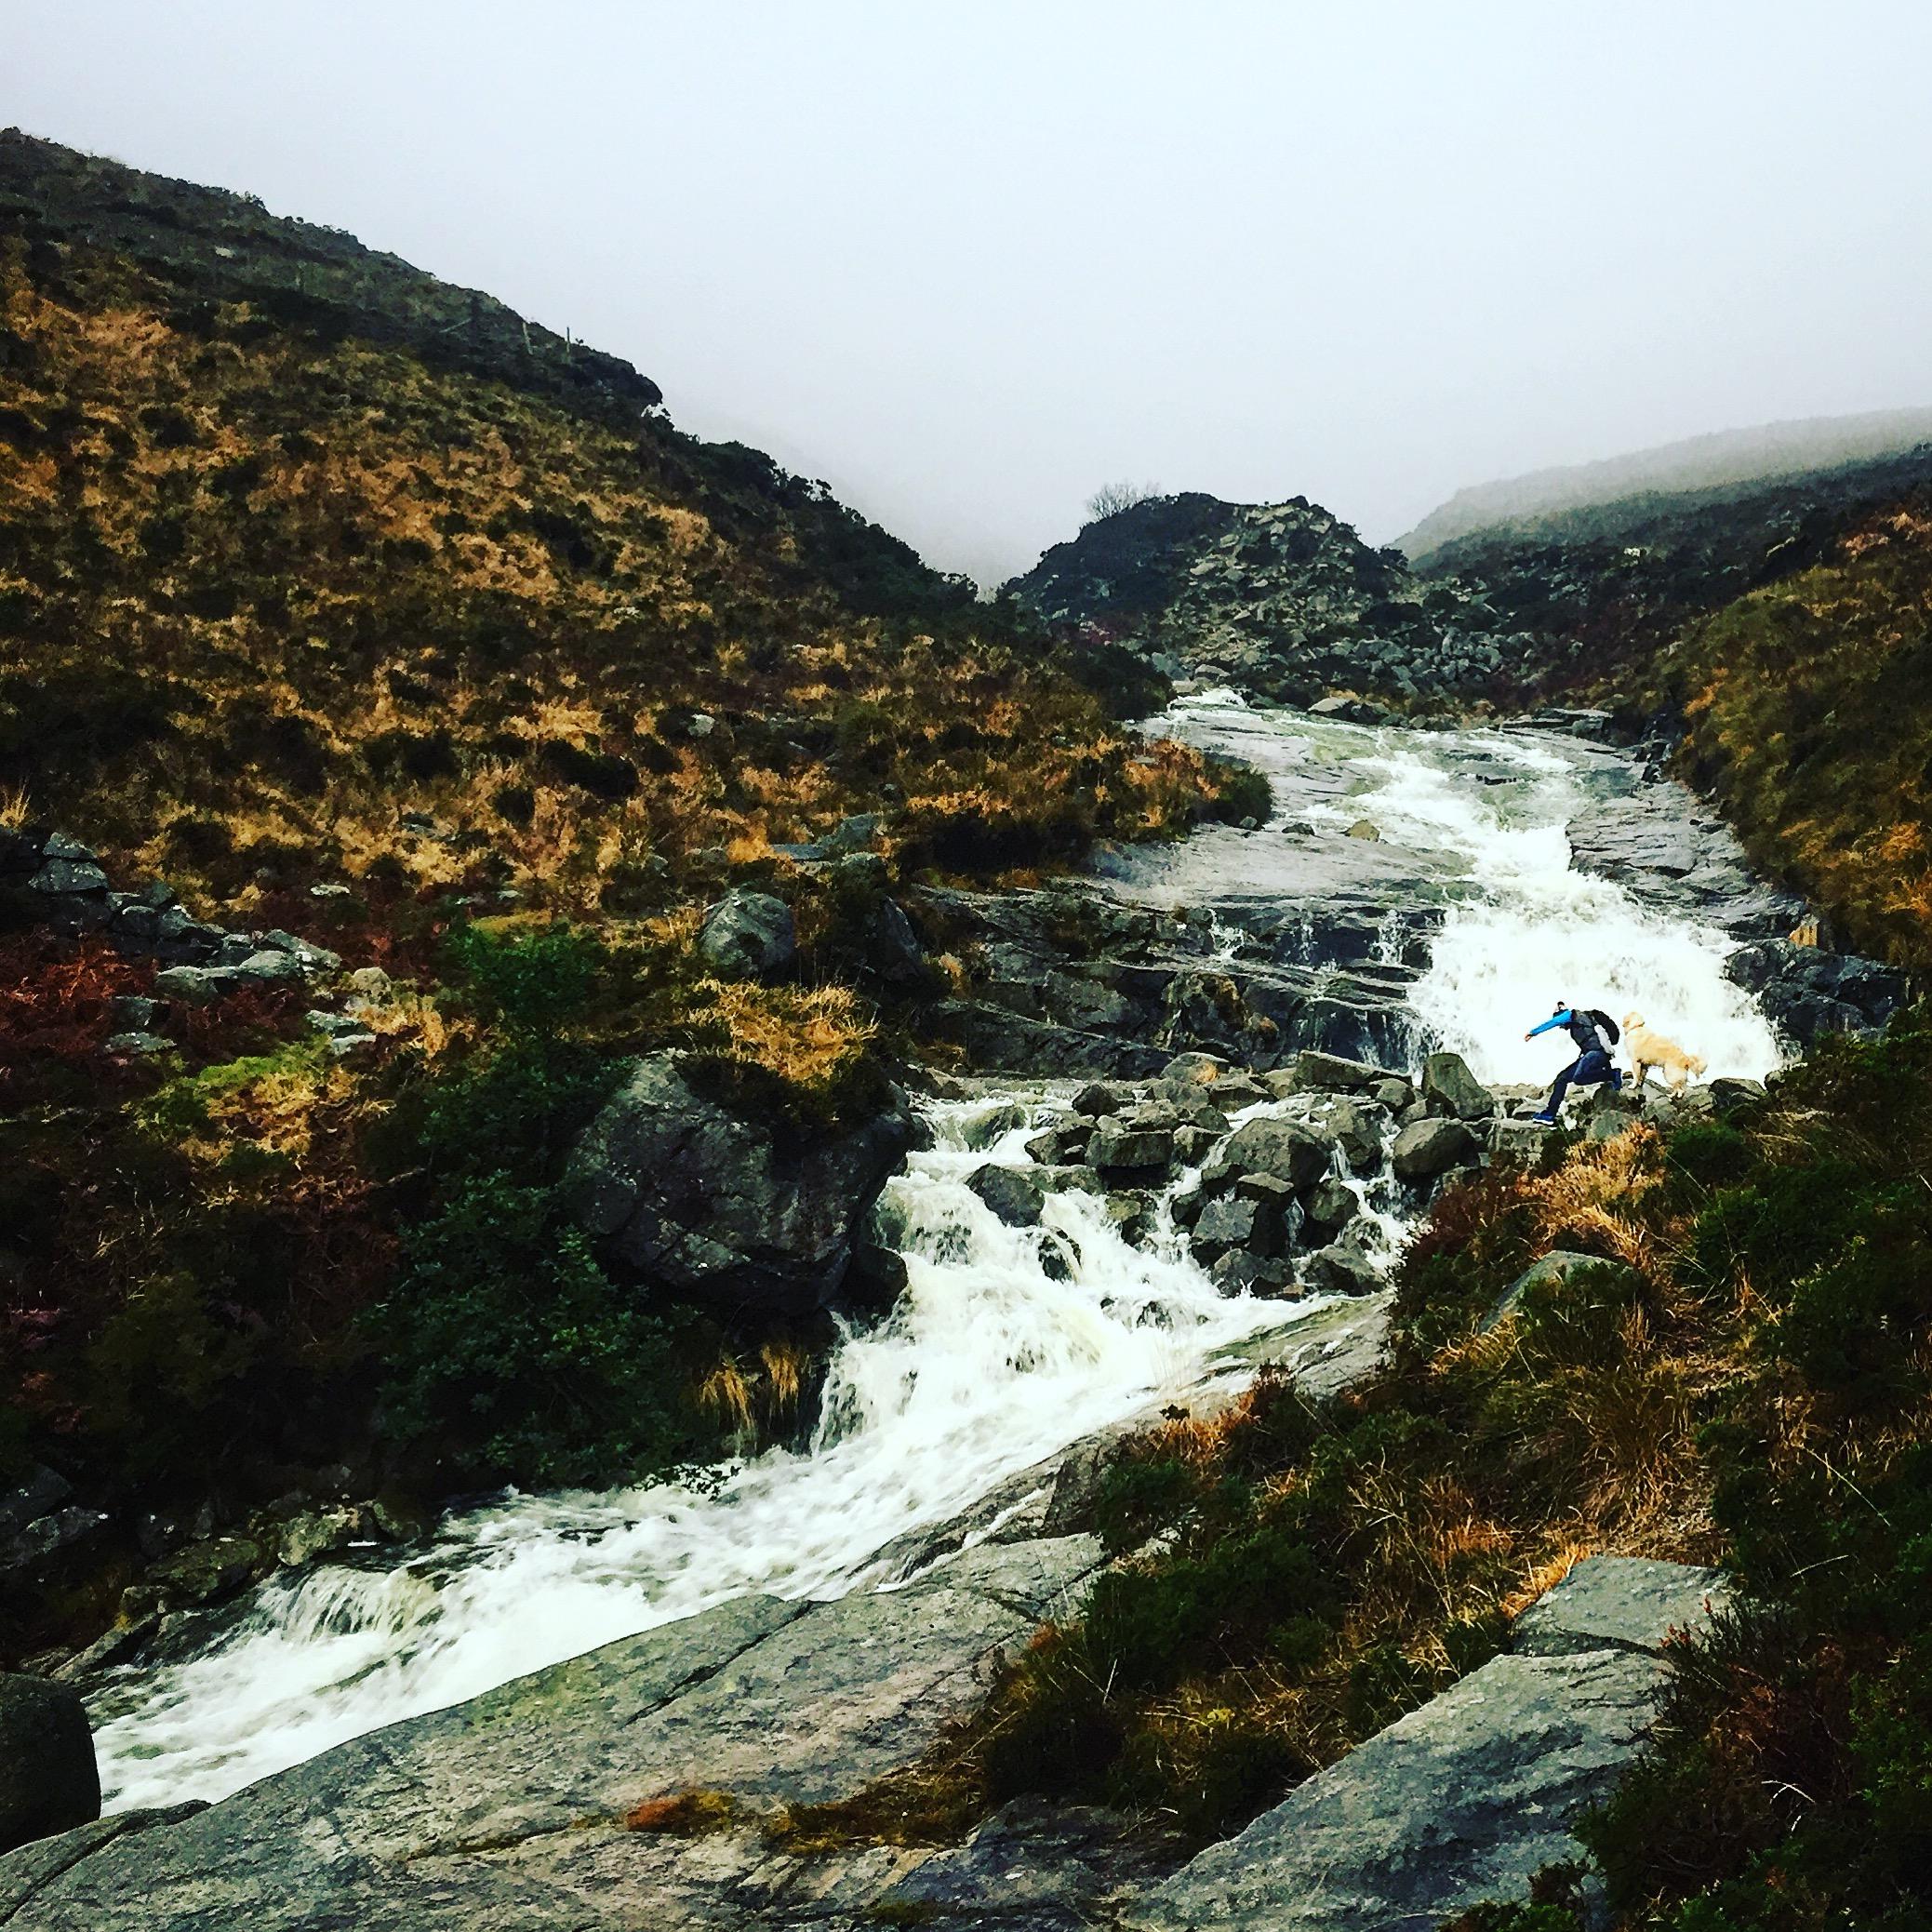 crossing_river_dog_slieve_donard_newcastle_tollymore_mourne_mountains_ni_explorer_niexplorer_northern_ireland_blog.jpg